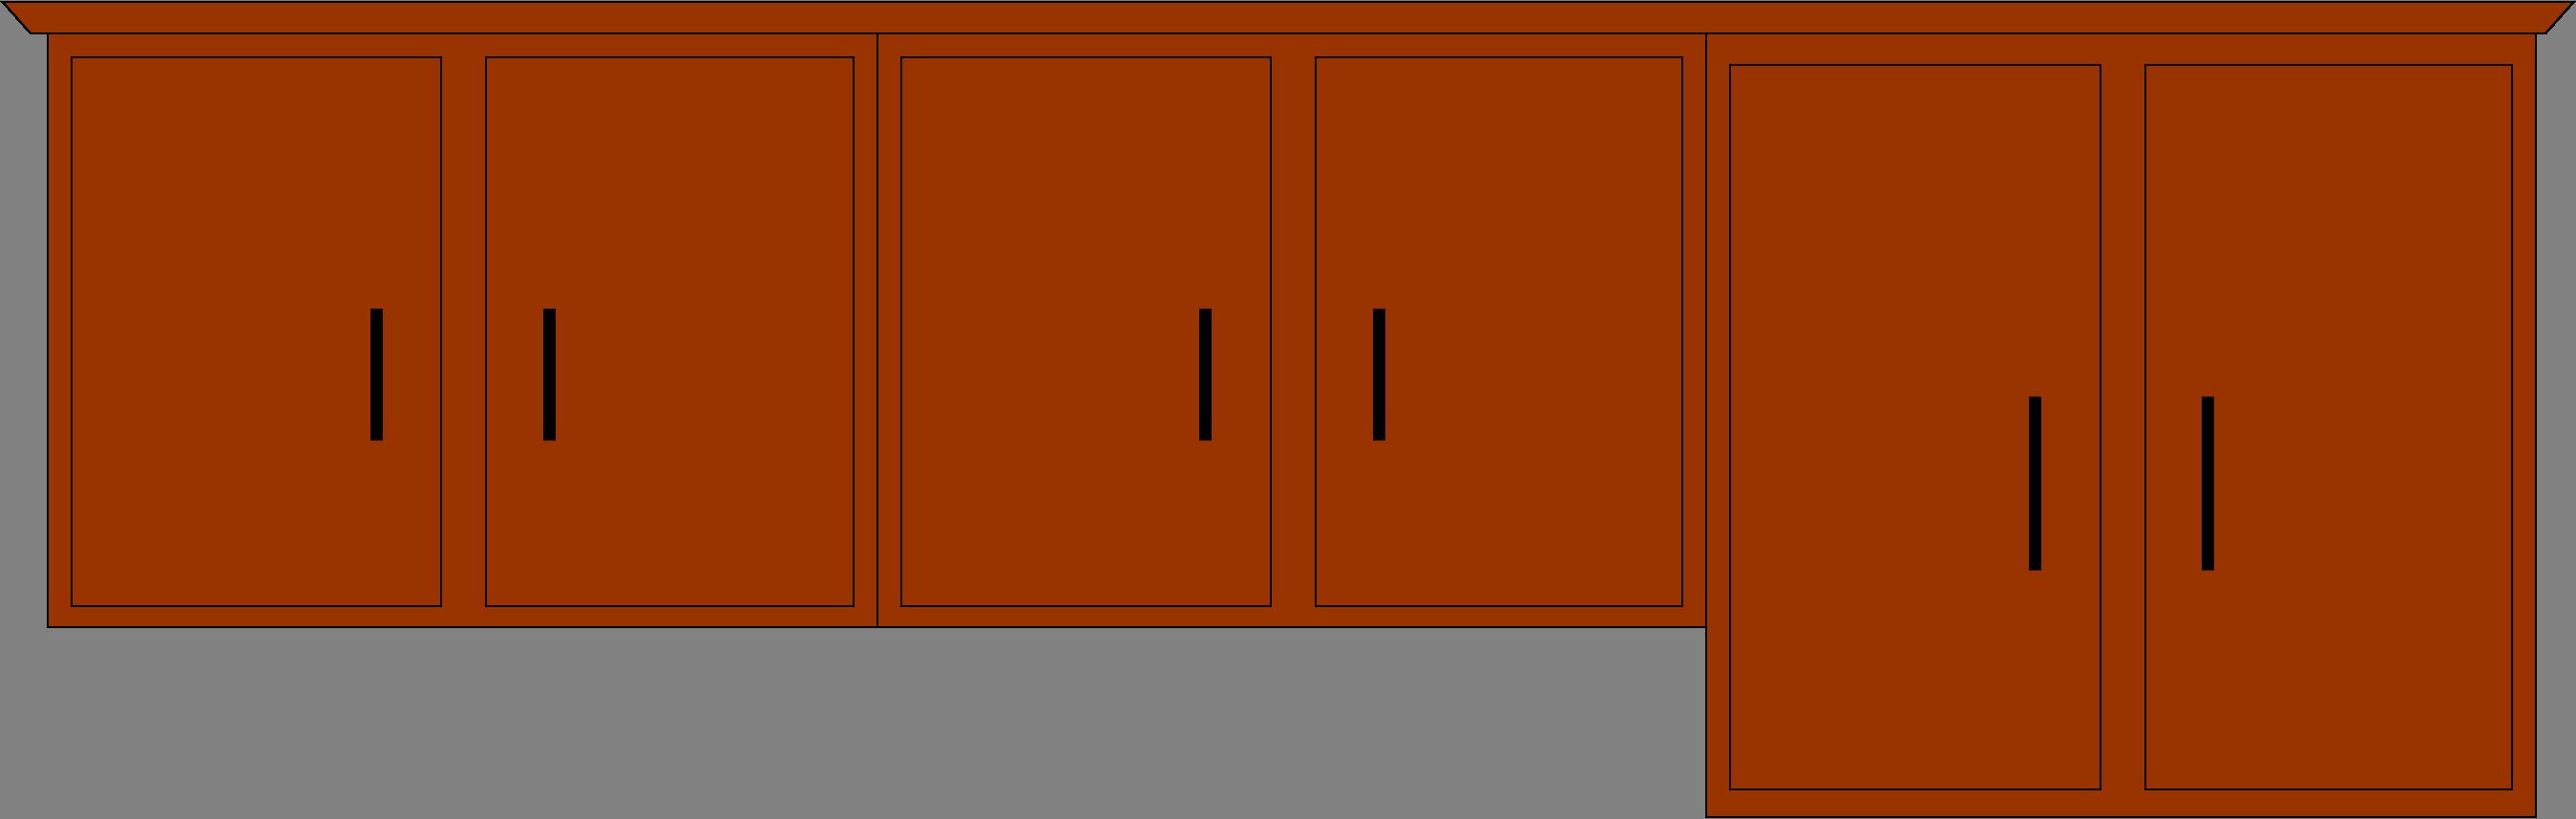 Free Cupboard Cliparts, Download Free Clip Art, Free Clip.